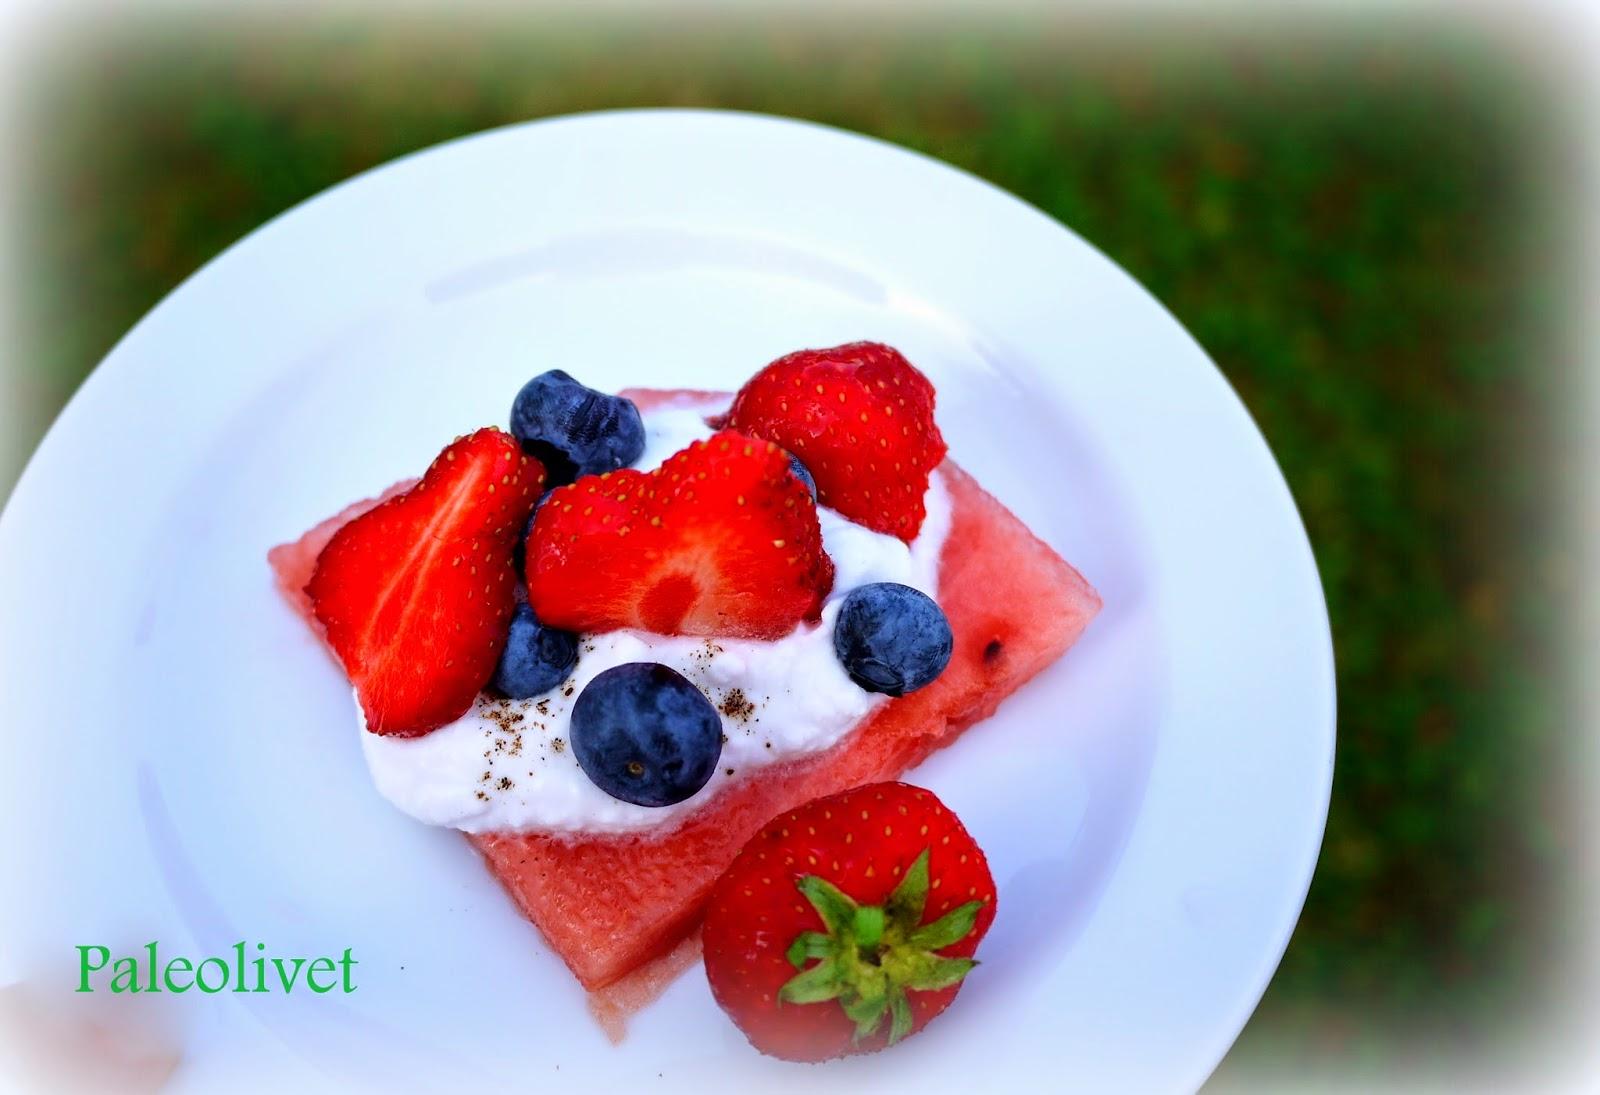 Paleo vandmelond dessert